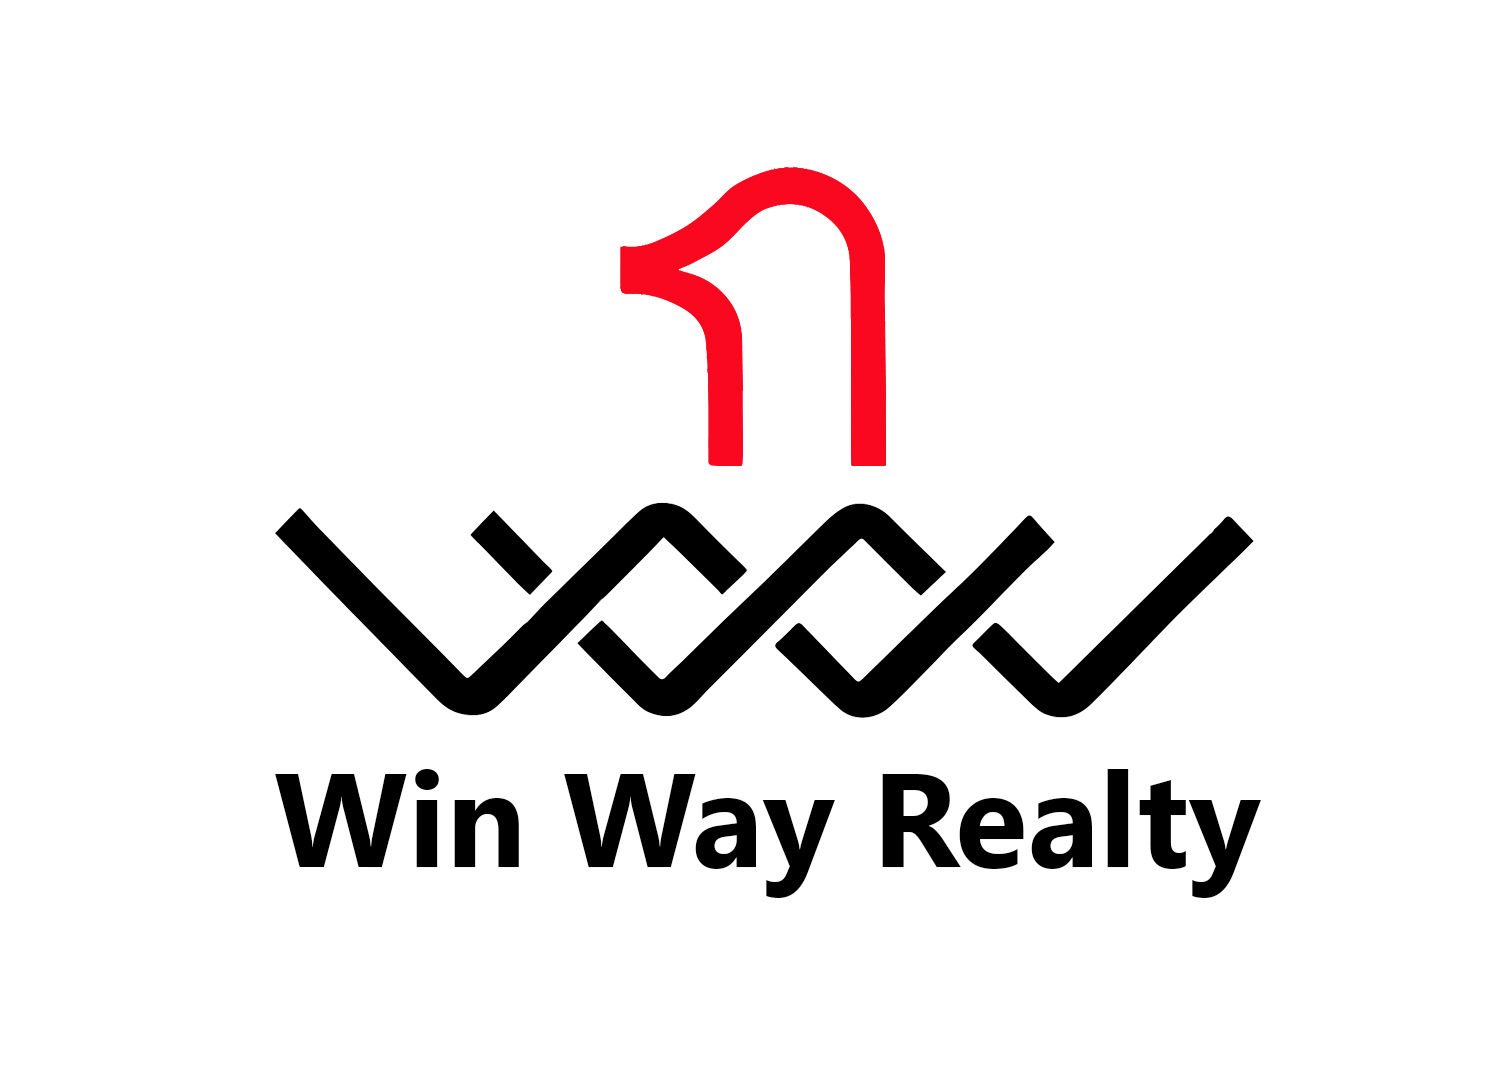 Логотип для агентства недвижимости фото f_0565aabe8687b10b.jpg